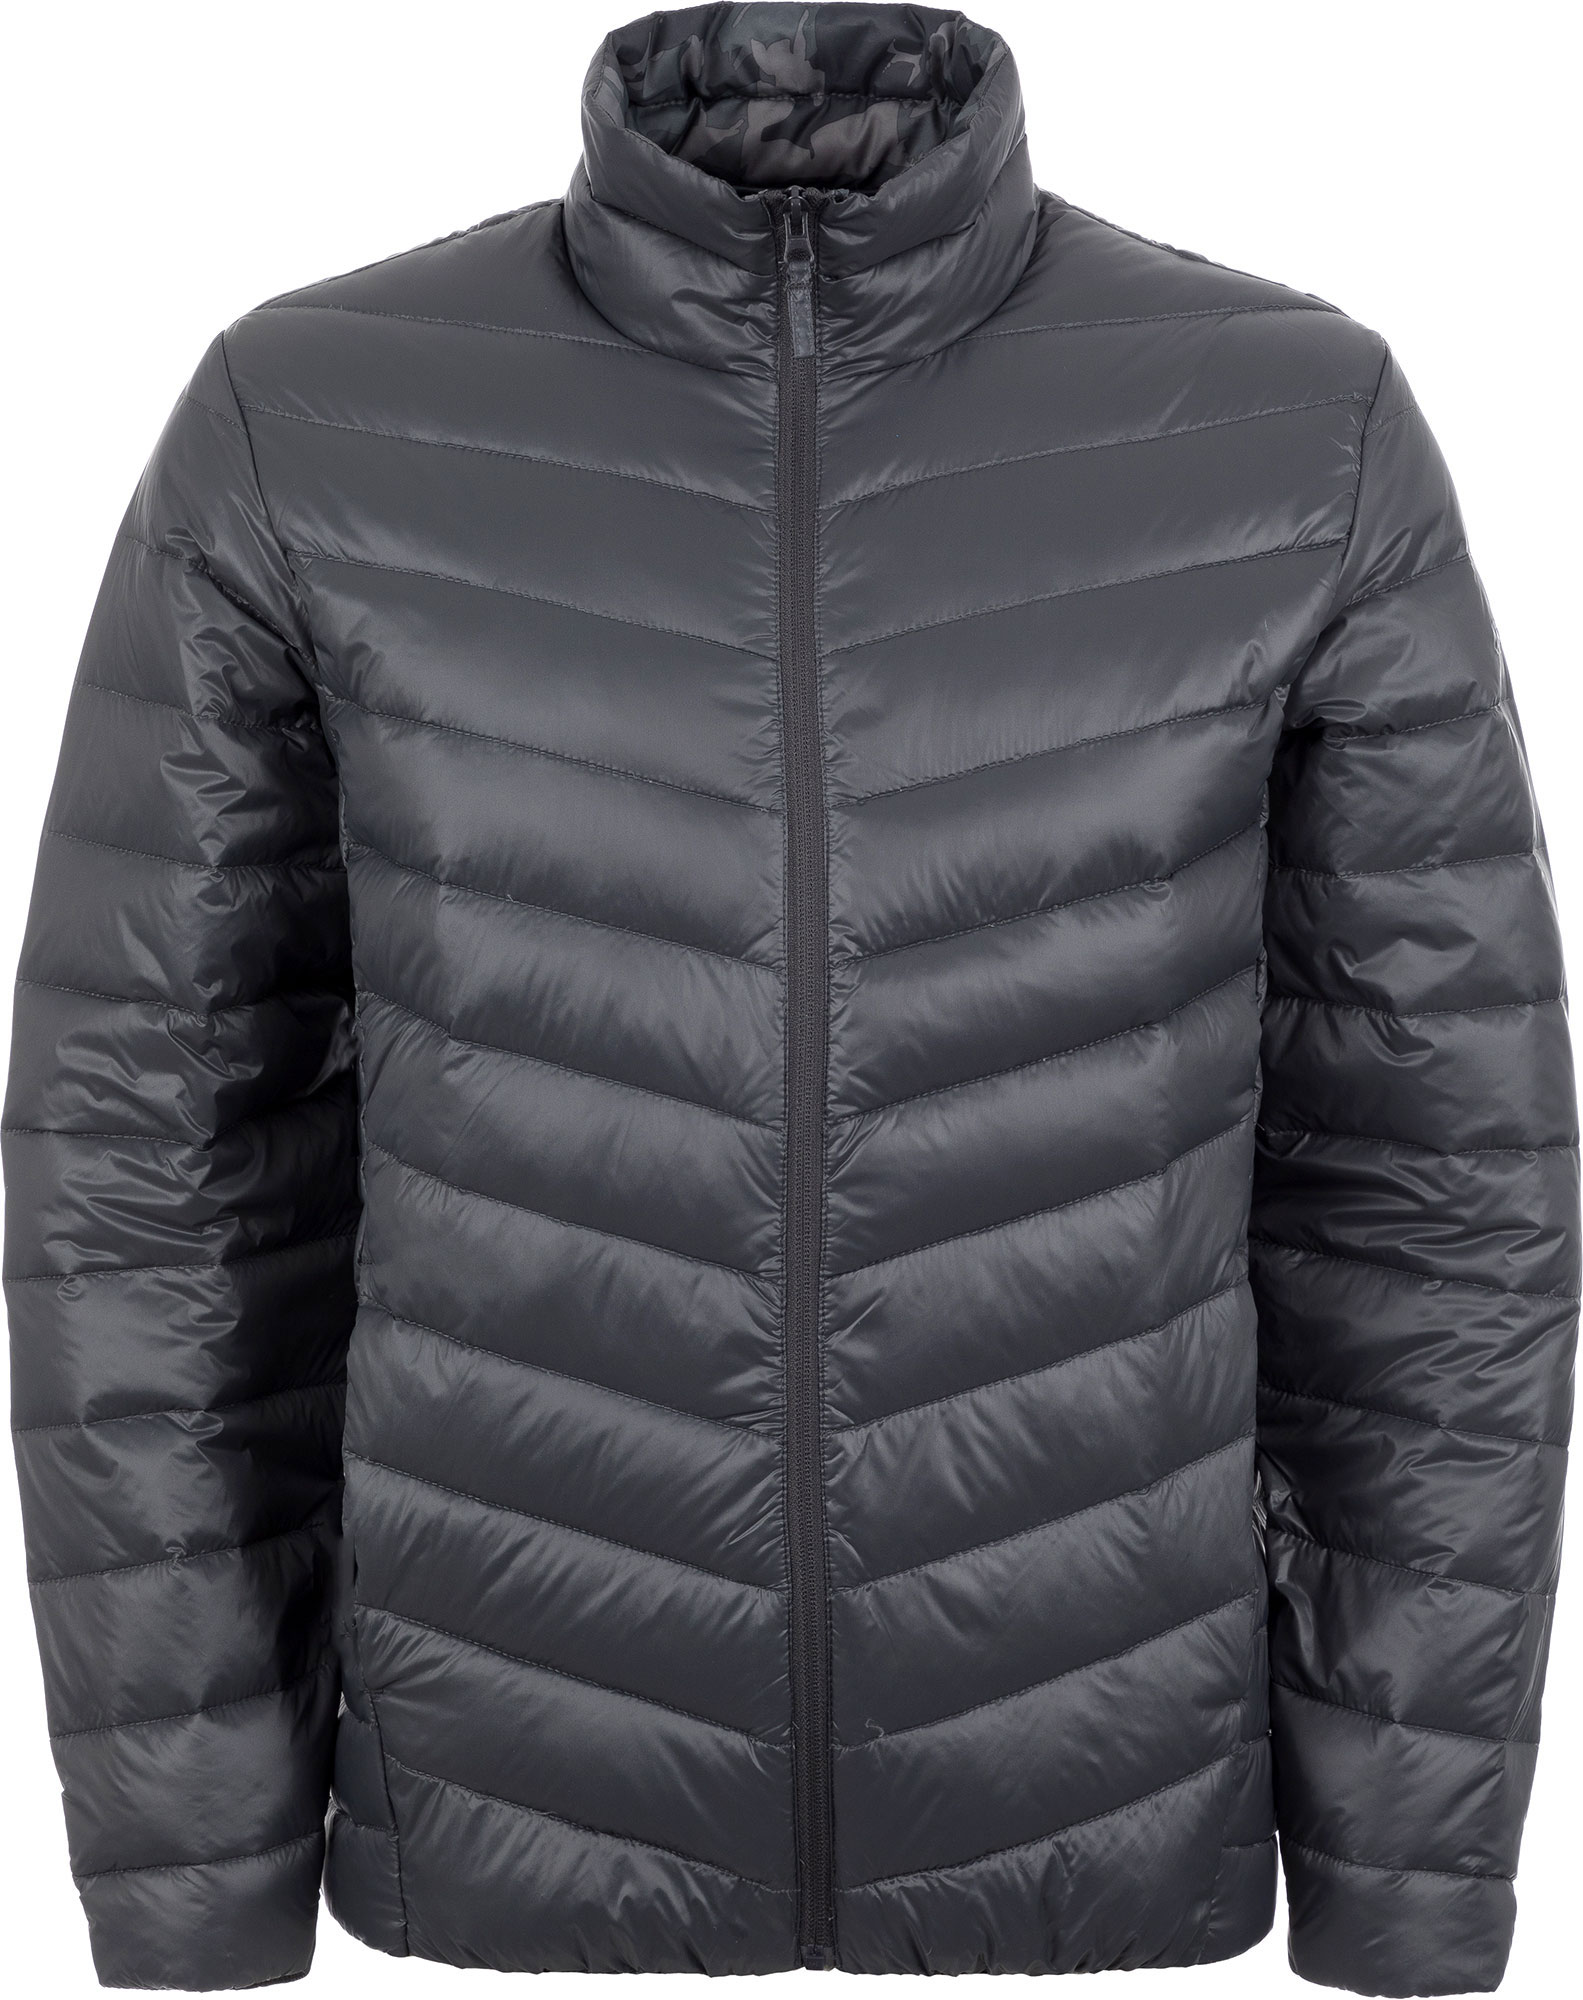 Outventure Куртка пуховая мужская Outventure, размер 54 куртка мужская geox цвет темно синий m8220kt2447f4386 размер 54